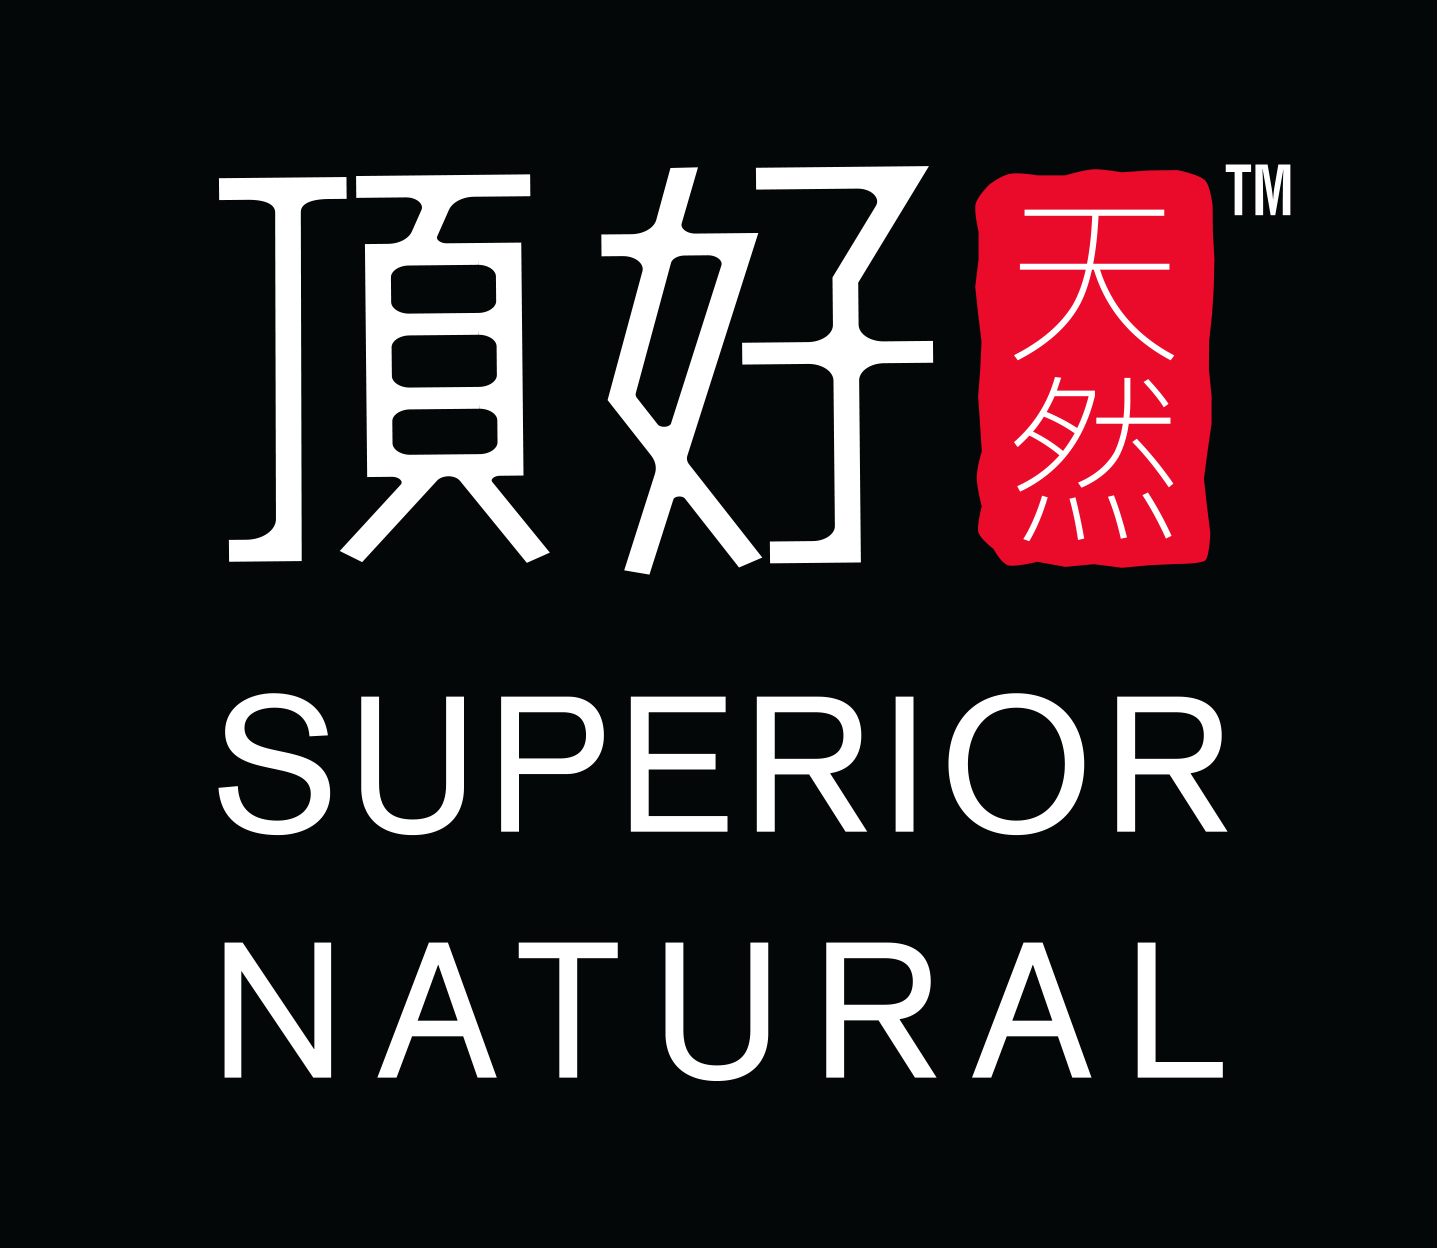 Superior Natural ULC logo